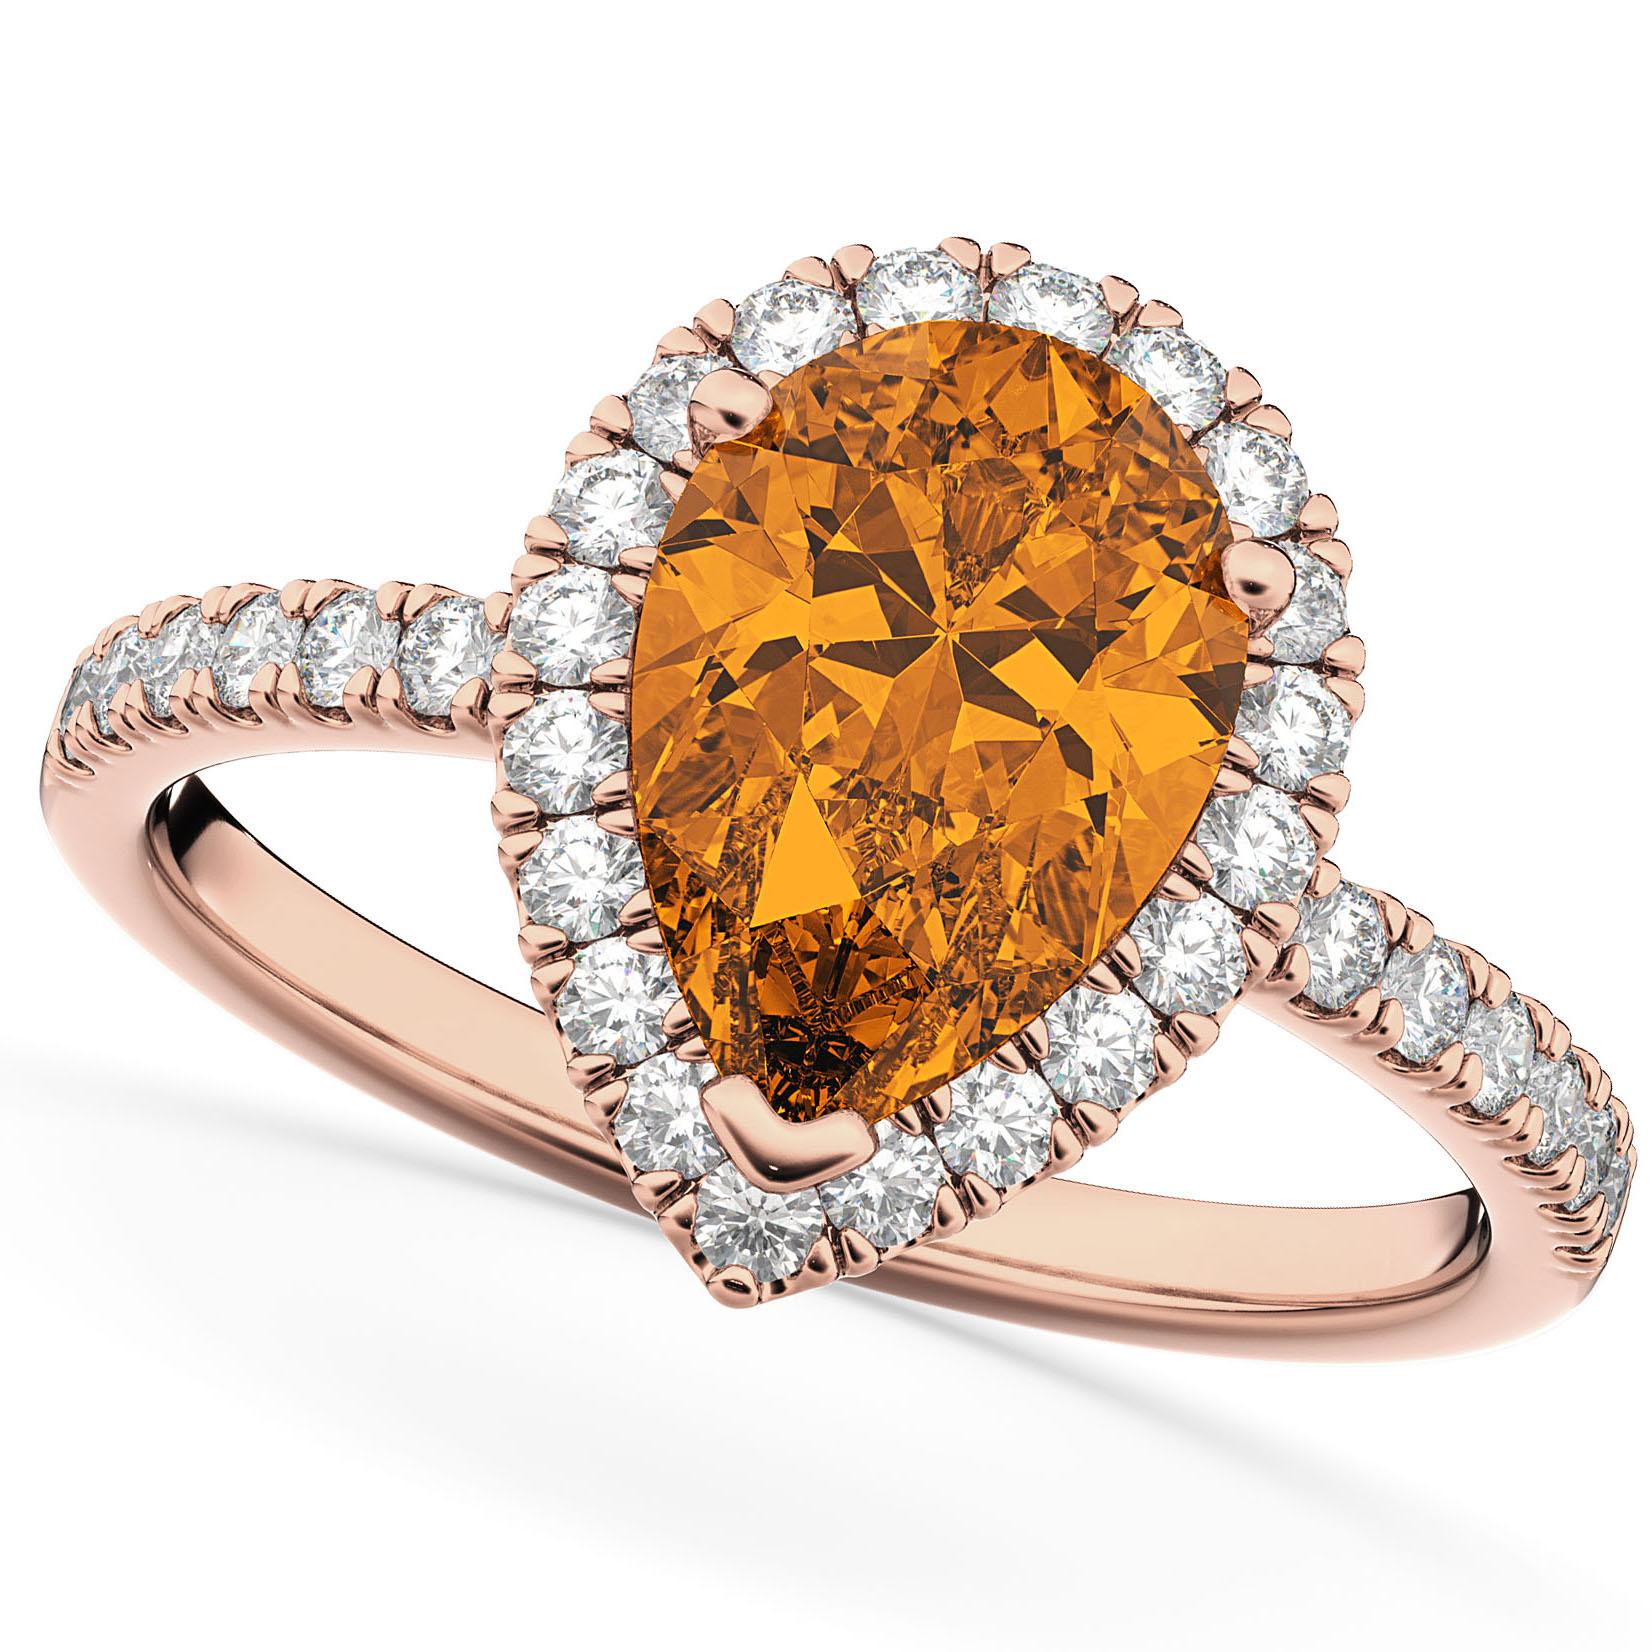 Pear Cut Halo Citrine & Diamond Engagement Ring 14K Rose Gold 2.21ct